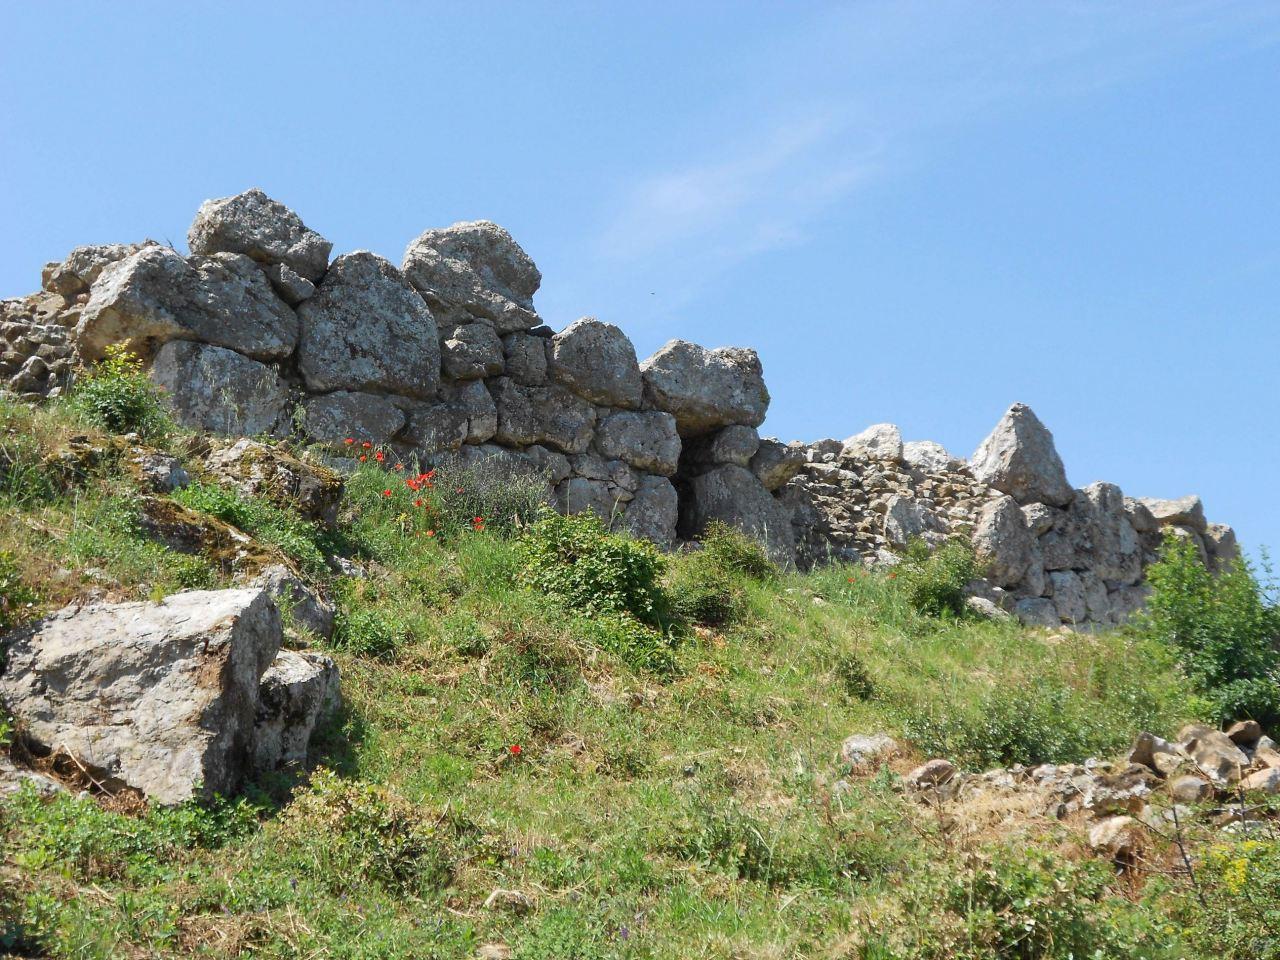 Roselle-Mura-Megalitiche-Roselle-Grosseto-Toscana-Italia-29